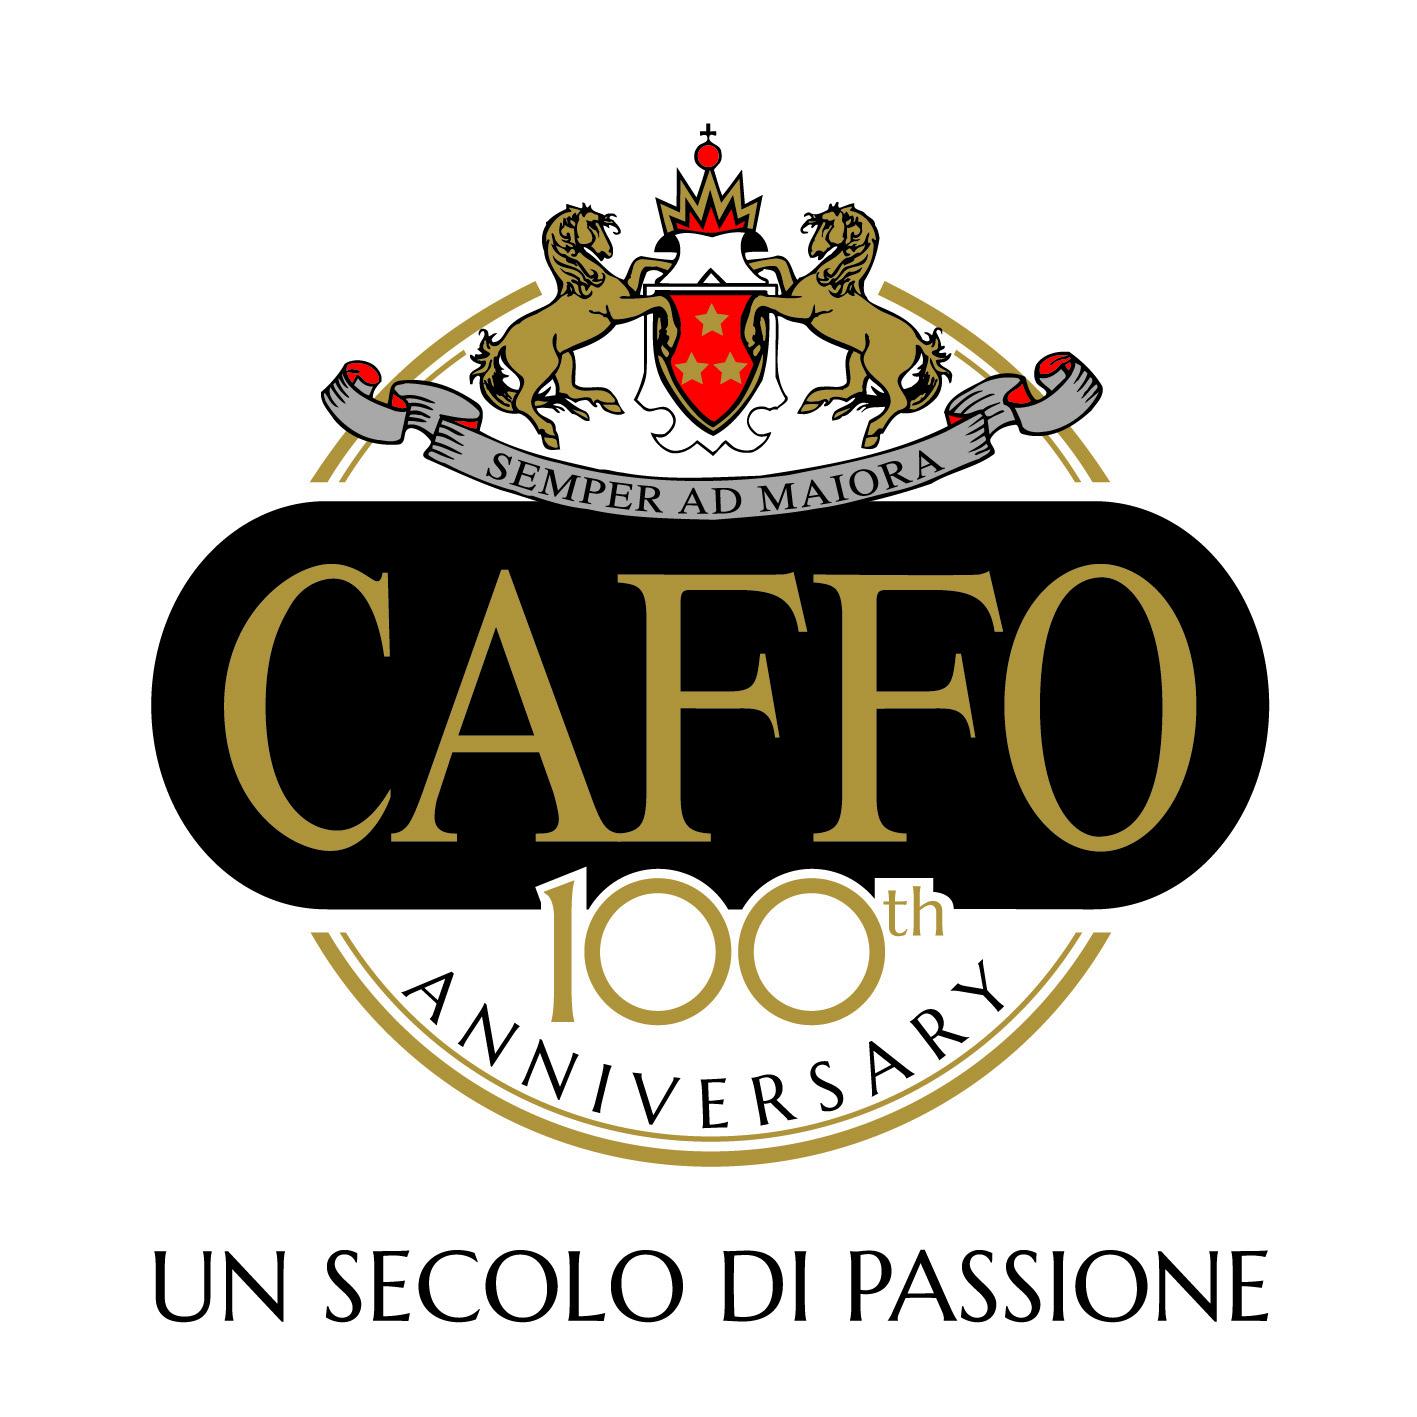 Gruppo Caffo